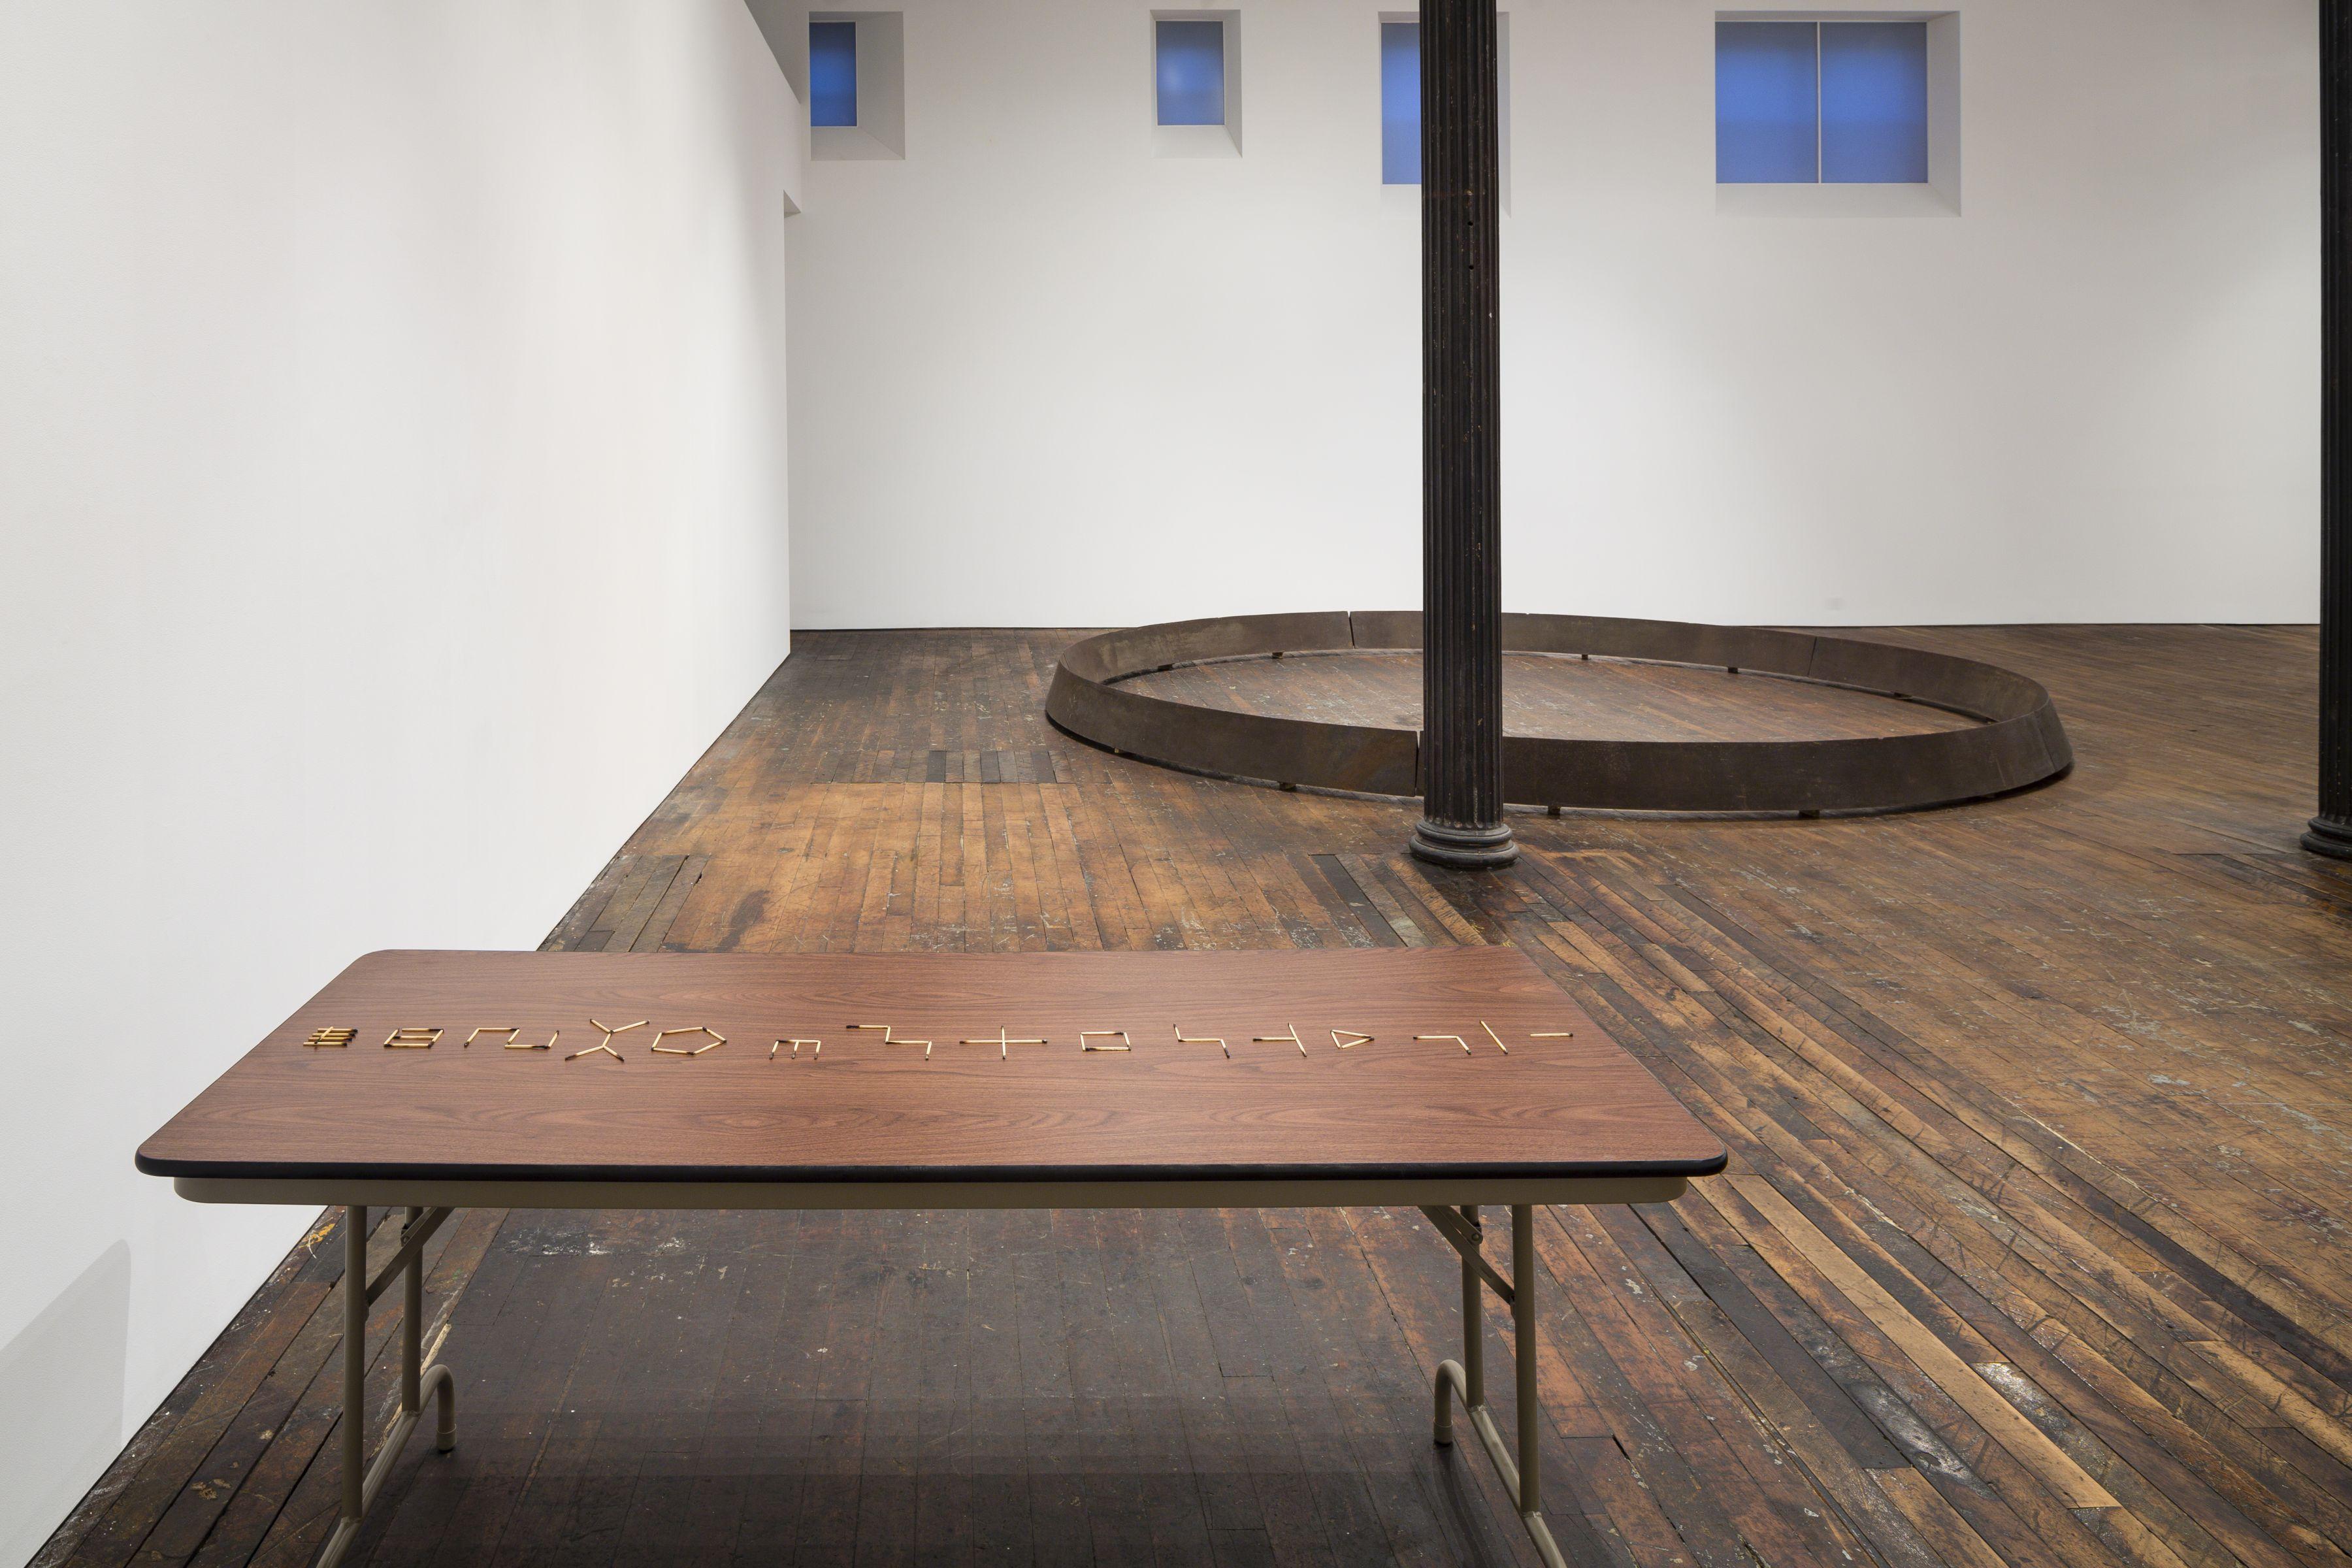 Untitled: Benassi, Bochner, Cabrita Reis, Gober, Nauman, Serra, Sosnowska, Tuttle, Walther– installation view 10